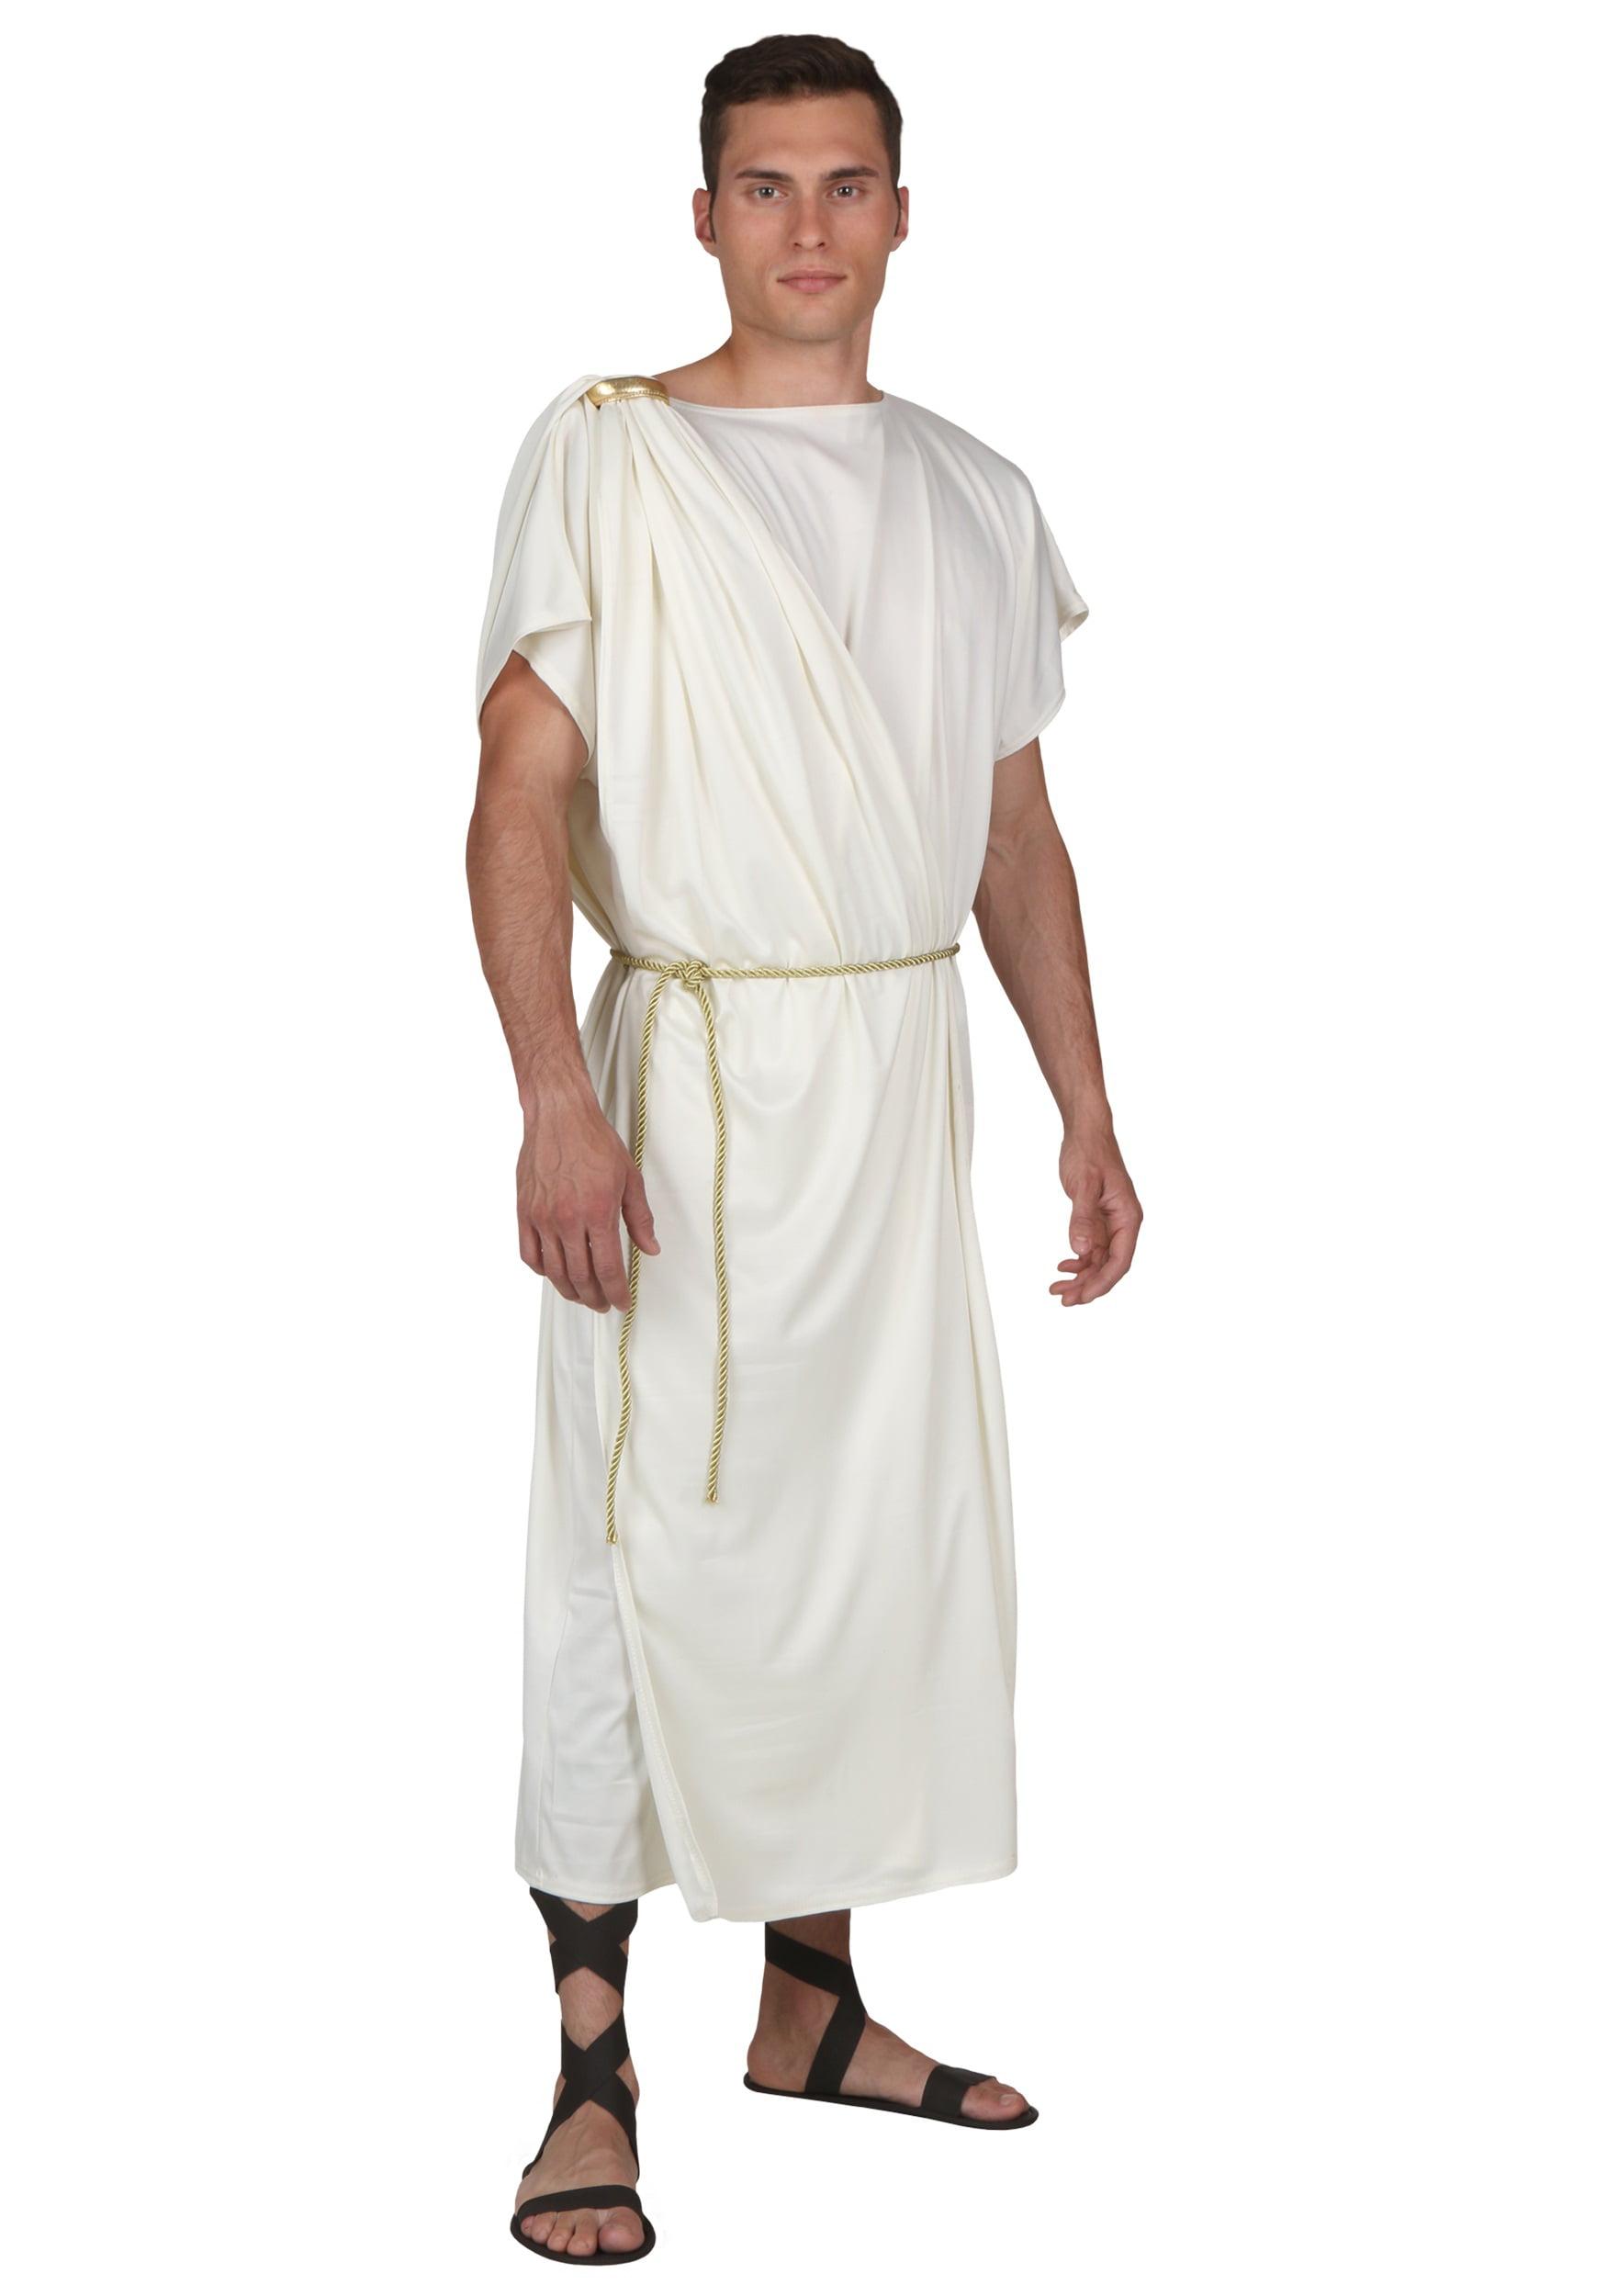 Мужской костюм древней греции фото